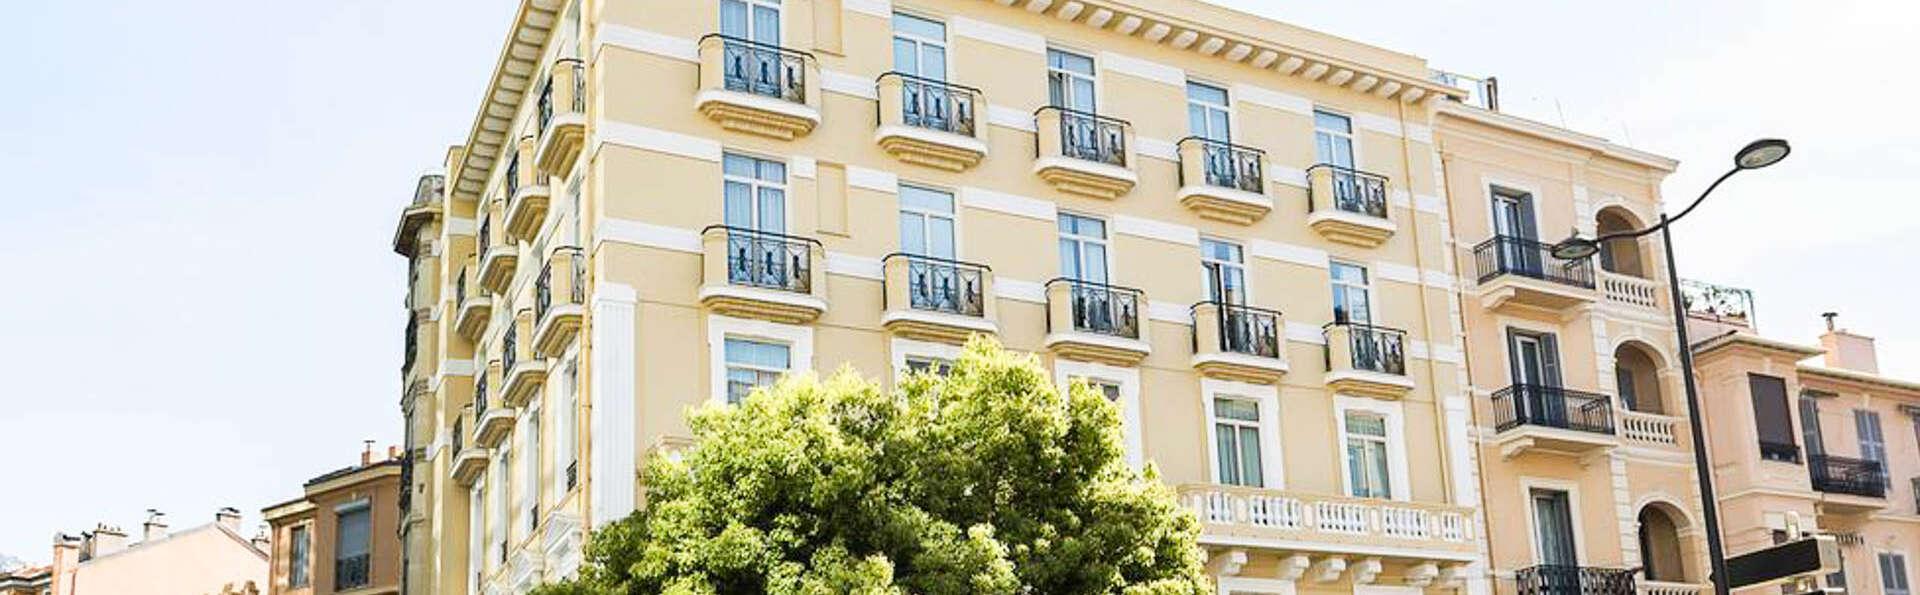 Hôtel Ambassador Monaco - EDIT_WEB_FRONT.jpg